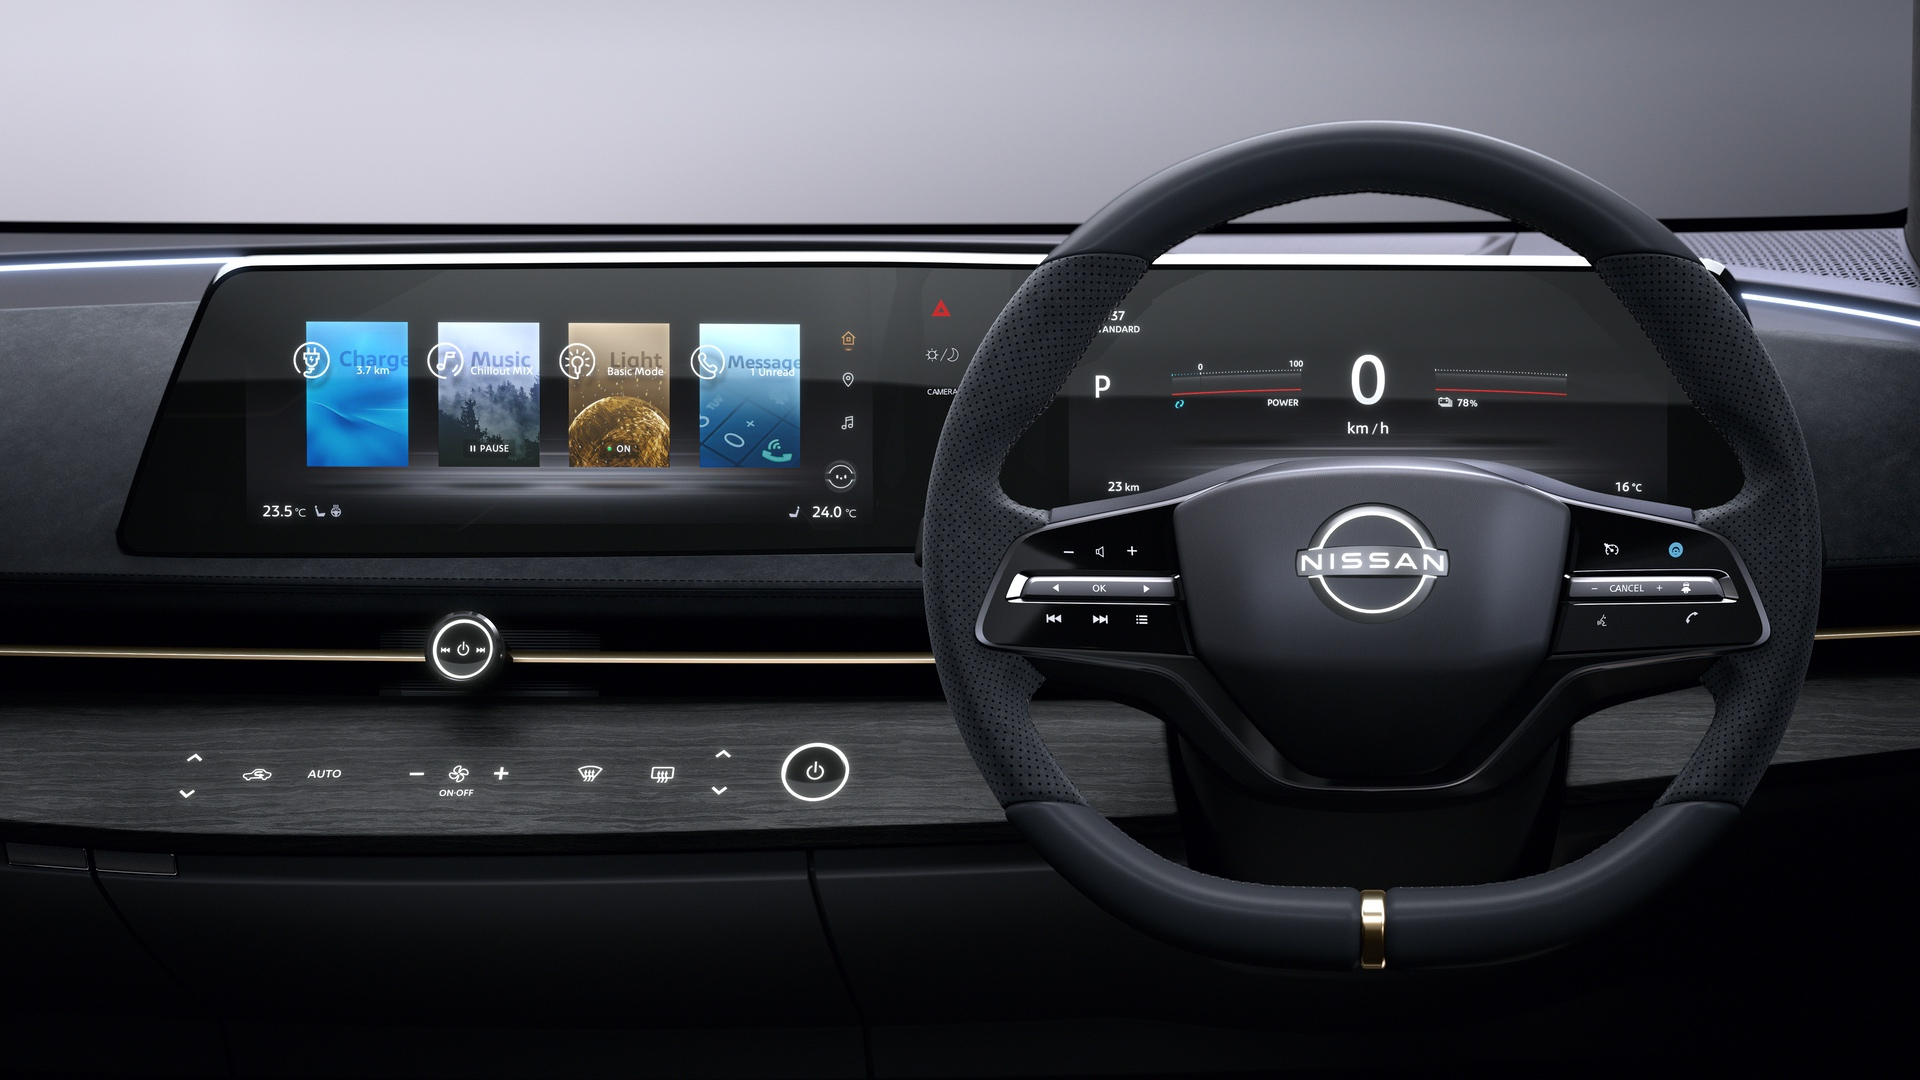 Nissan_Ariya_Concept_interior_0004